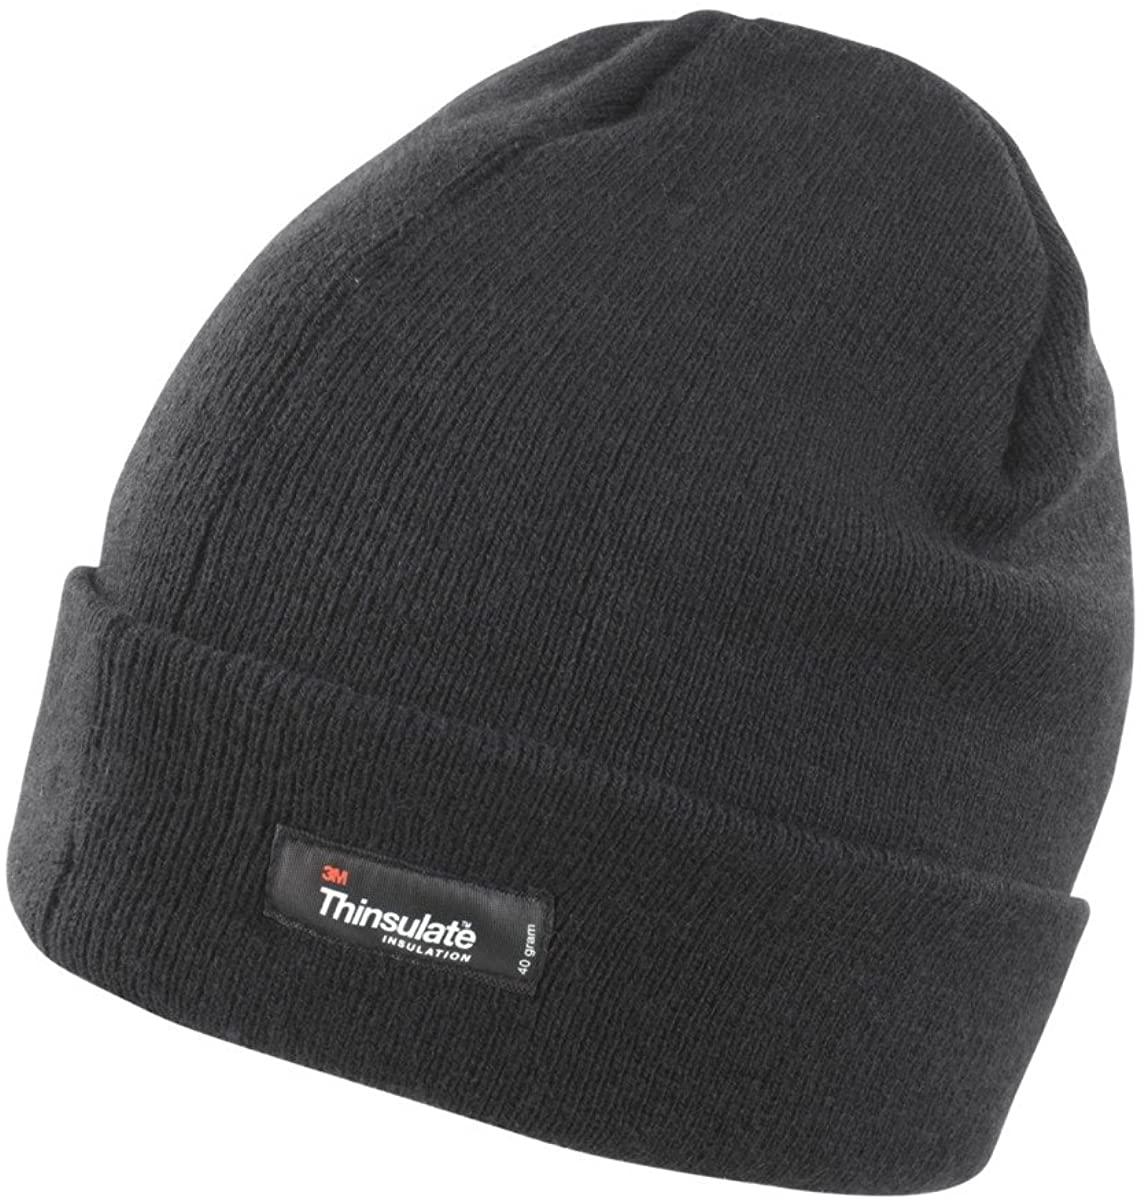 Result Unisex Lightweight Thermal Winter Thinsulate Hat (3M 40g)